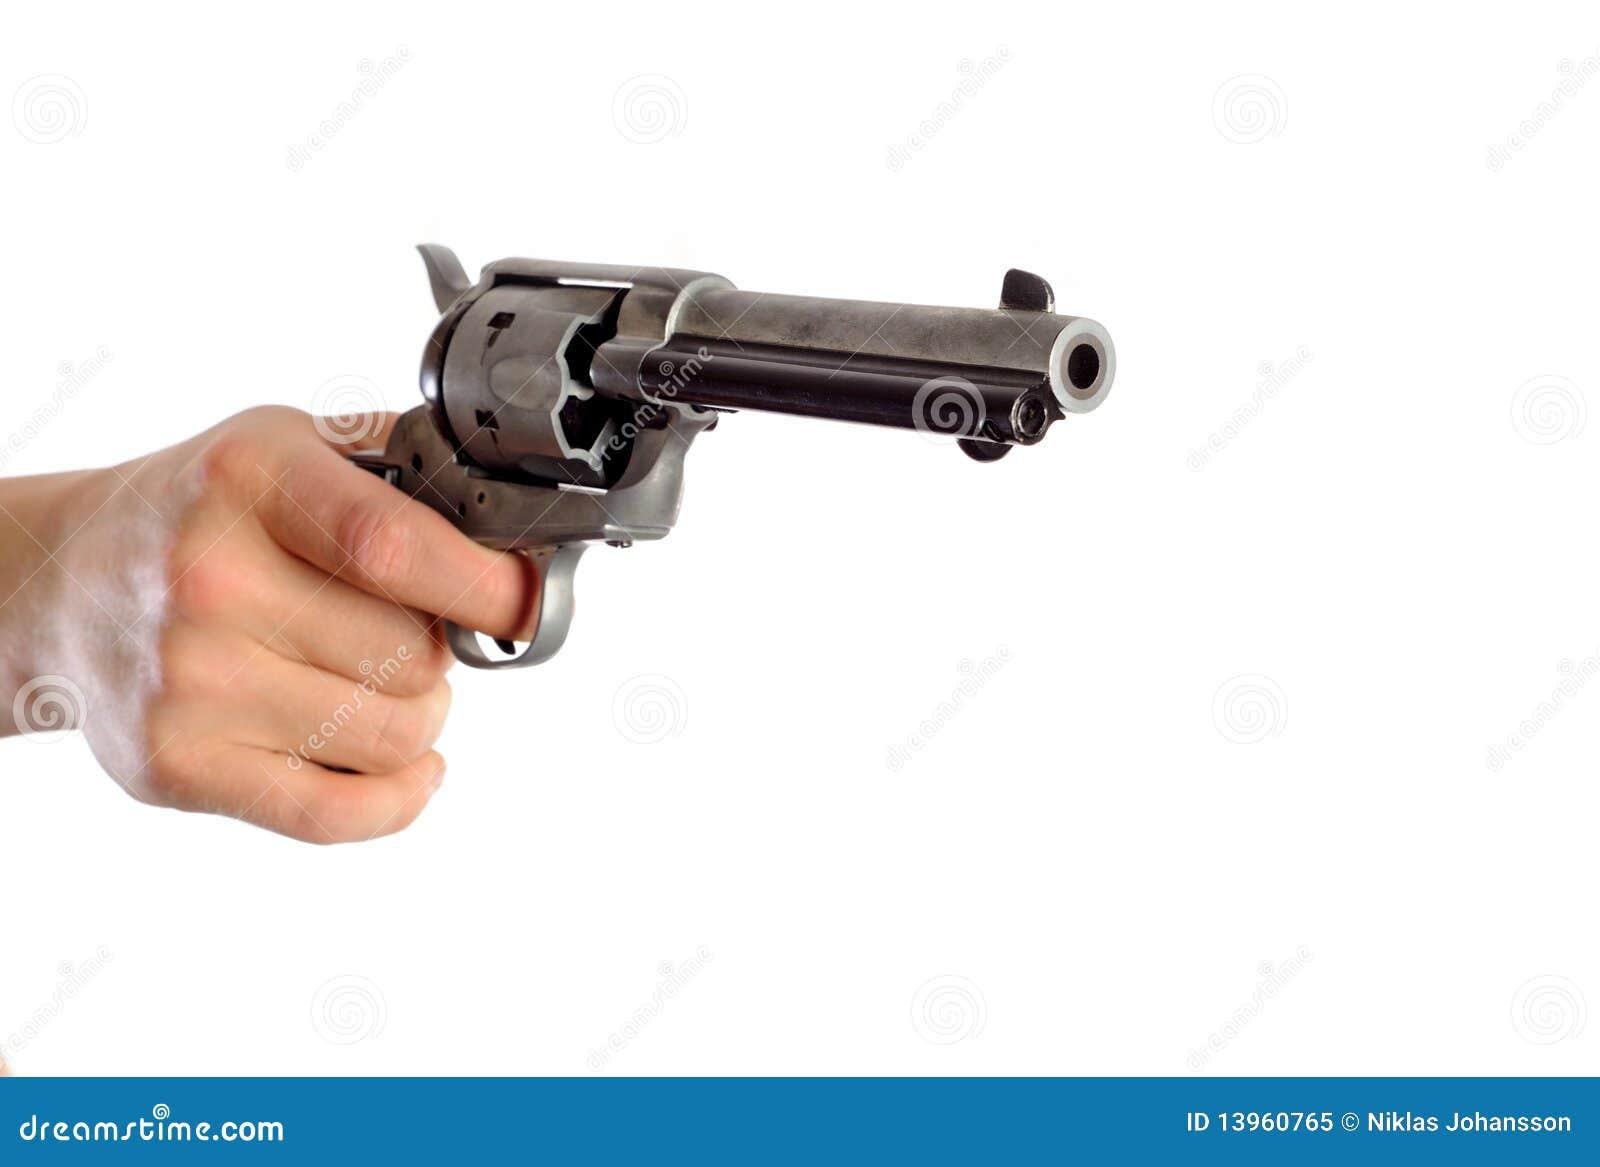 Hand Holding Gun Royalty Free Stock Photo - Image: 13960765